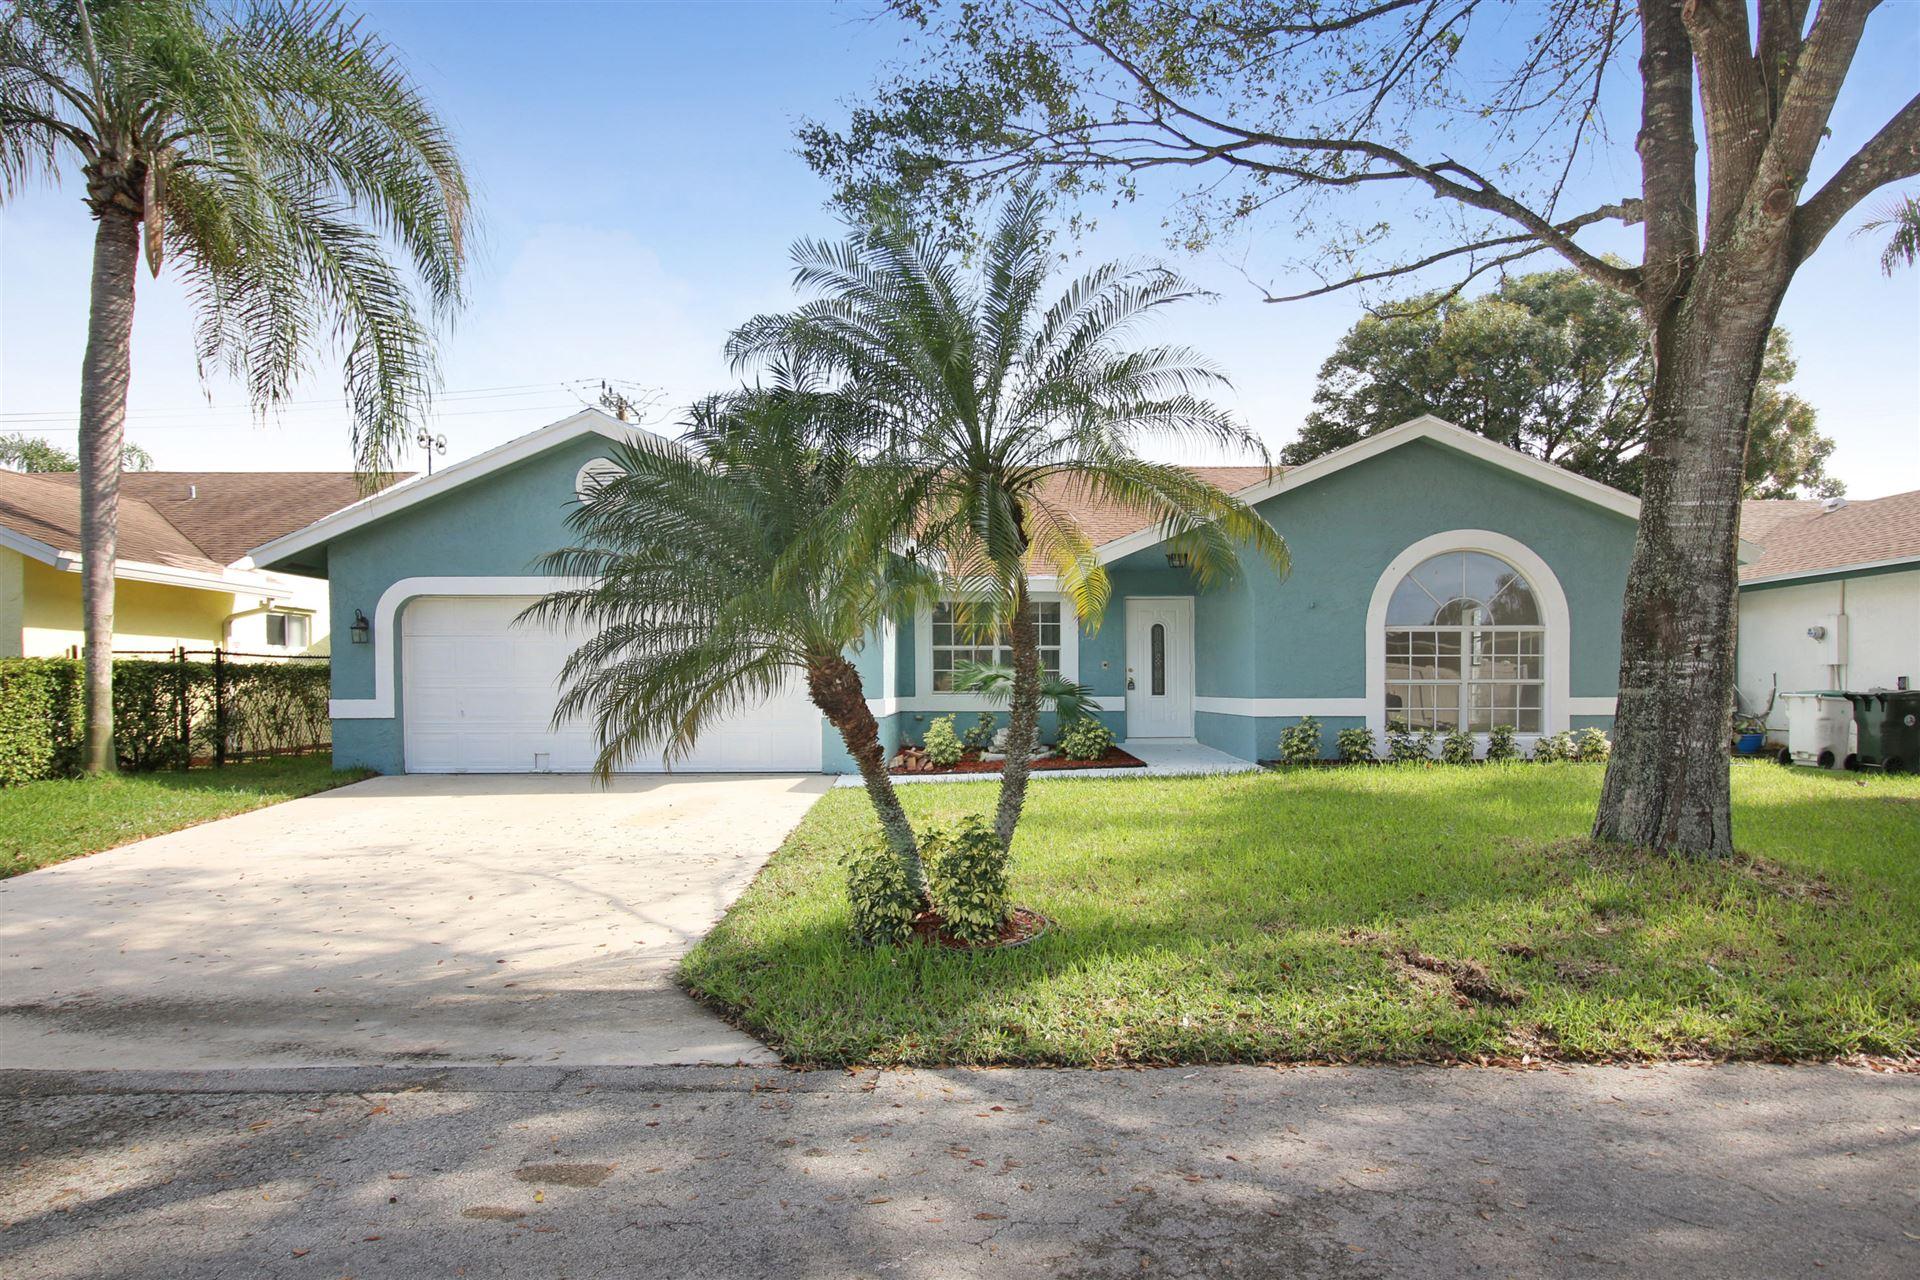 6630 NW 41 Terrace, Coconut Creek, FL 33073 - #: RX-10679383